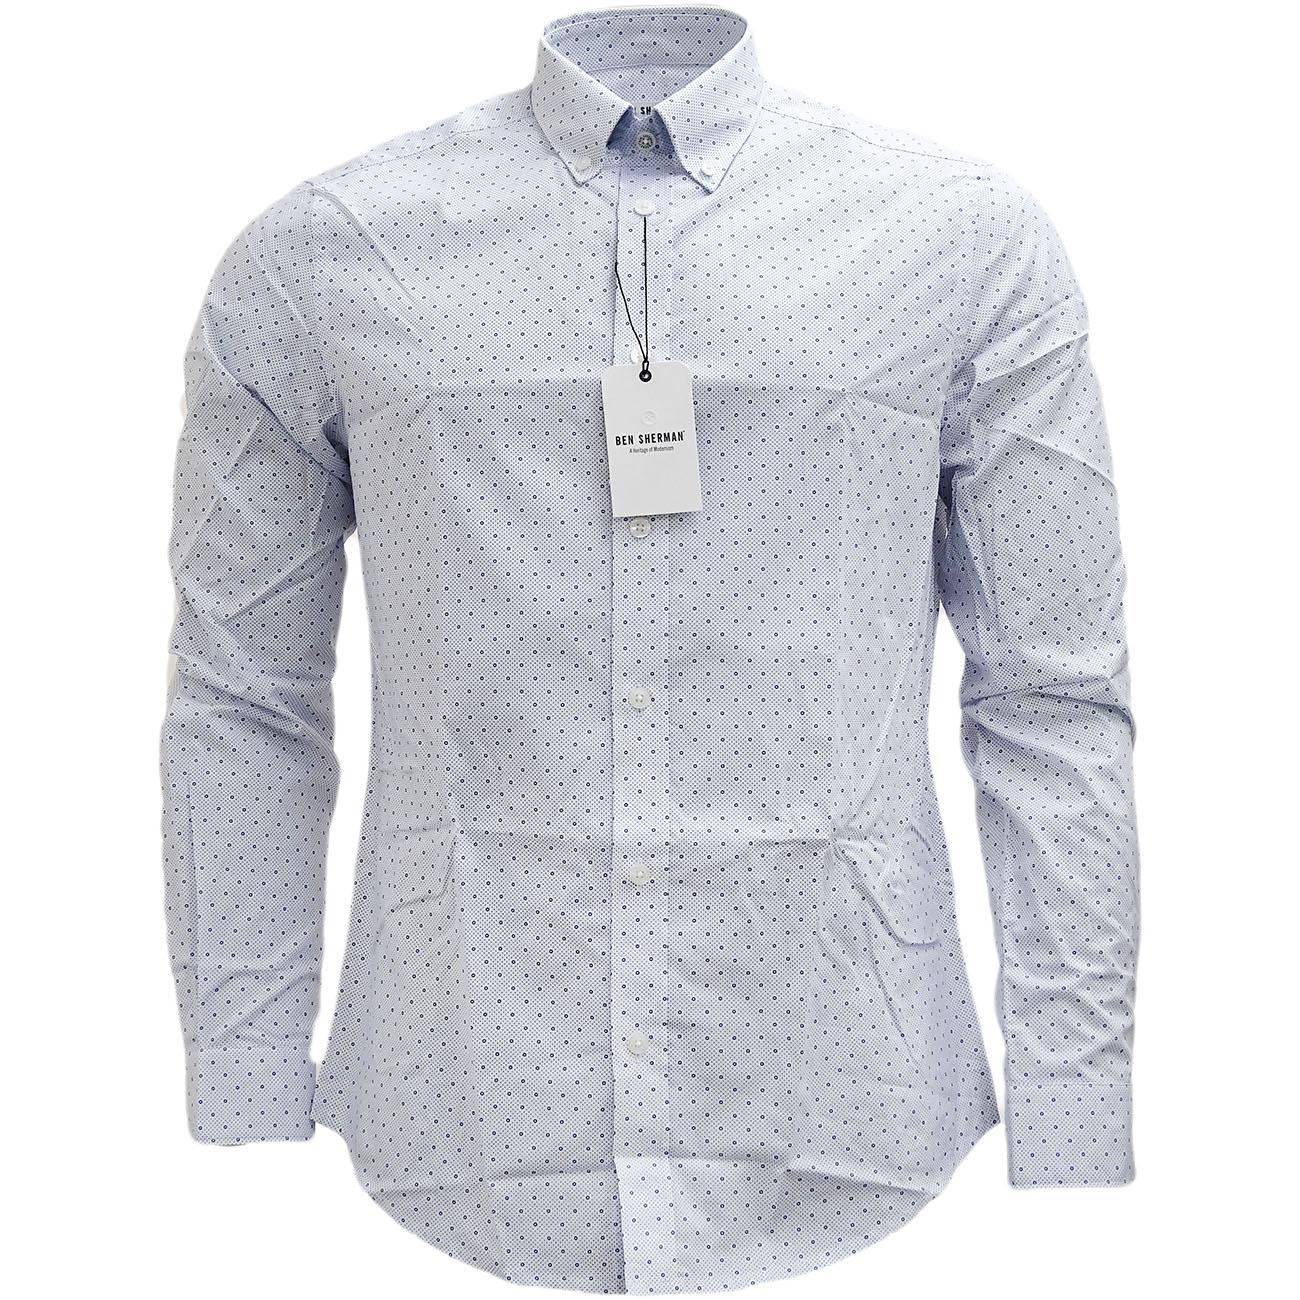 Mens Shirts Ben Sherman Long Sleeve Shirt